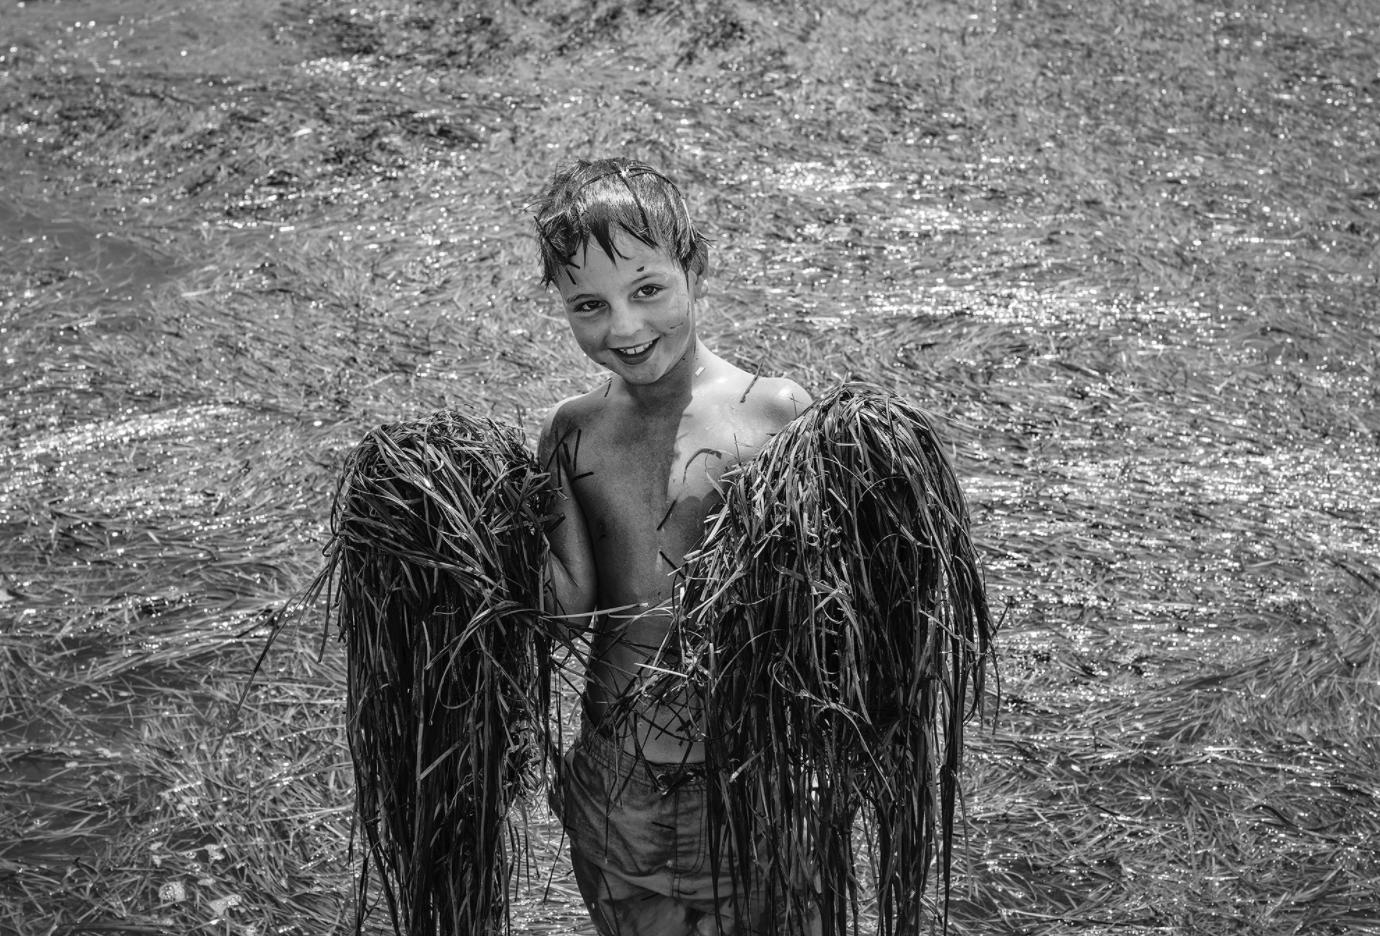 Beside Sport - Nikos Aliagas face à la mer - Angelo, l'ange de la lagune à Messolongi ©Nikos Aliagas -